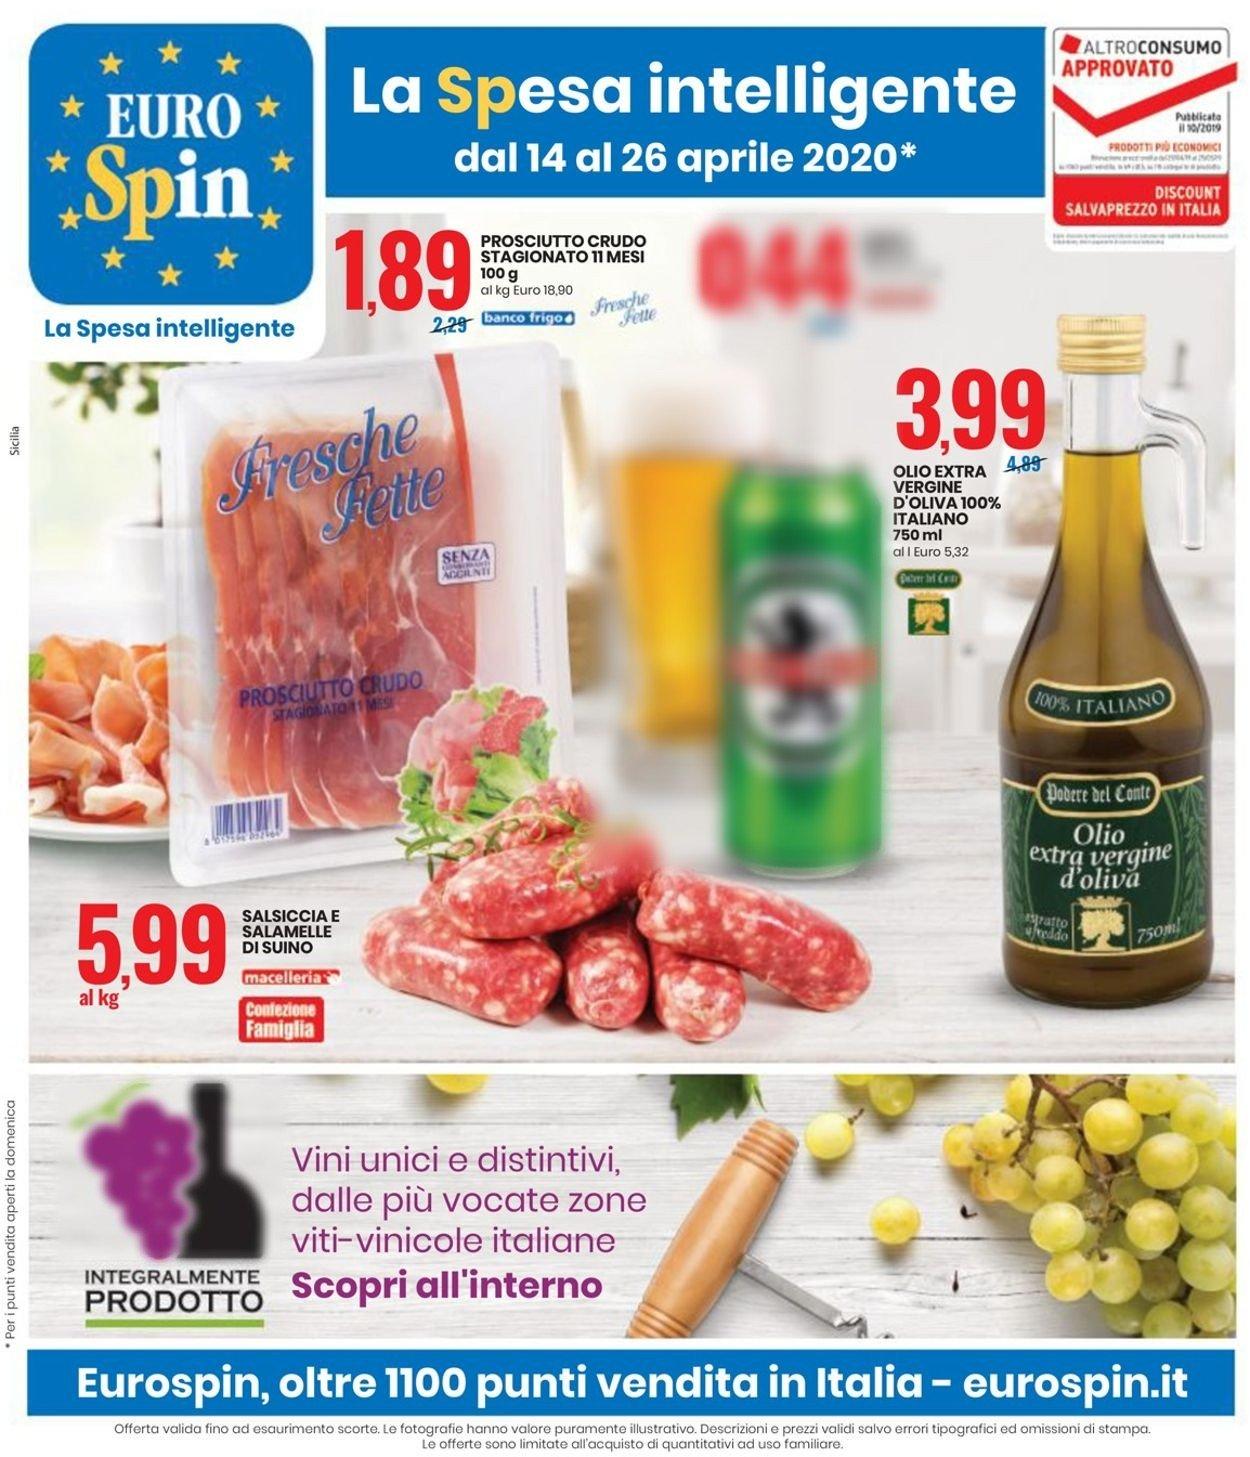 Volantino EURO Spin - Offerte 14/04-26/04/2020